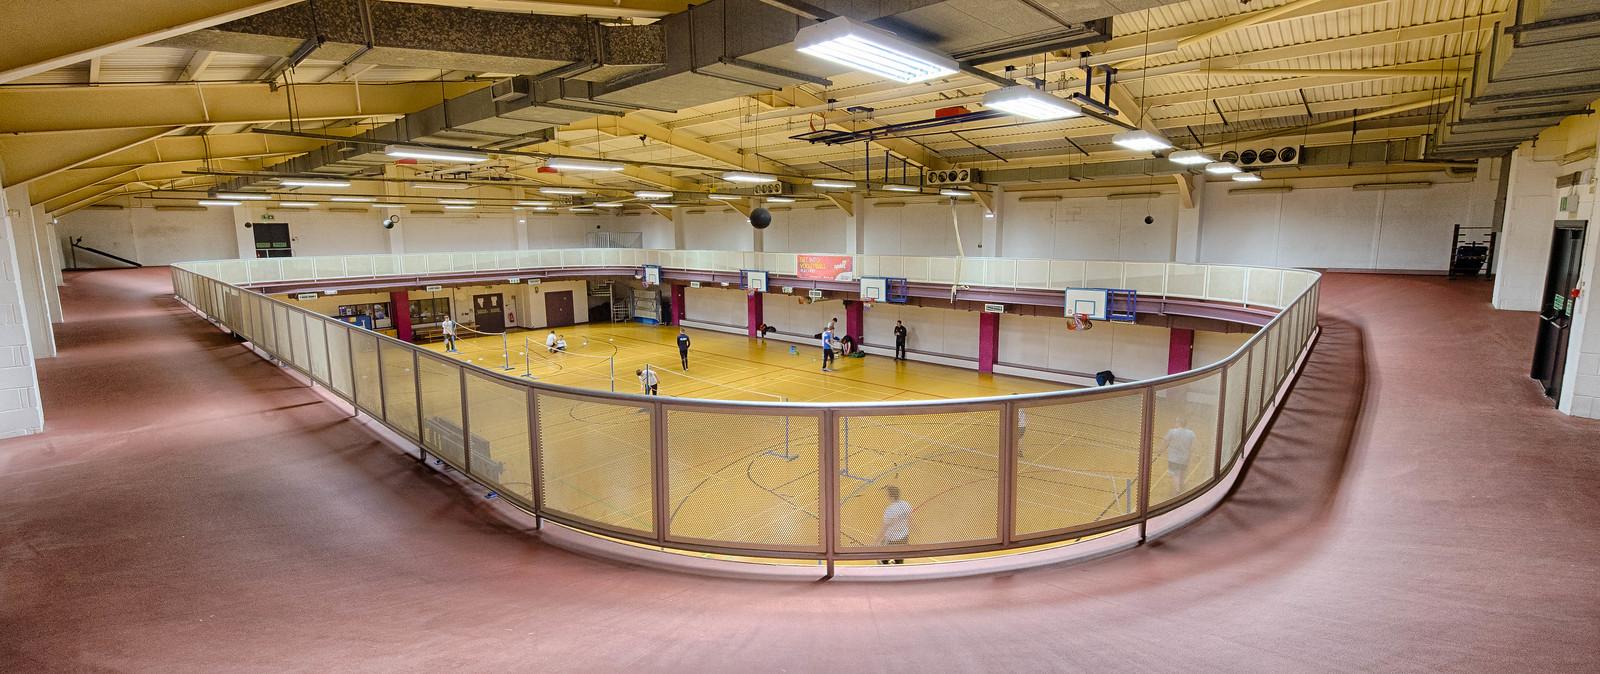 20170504 Yclub Sports Hall Running Track